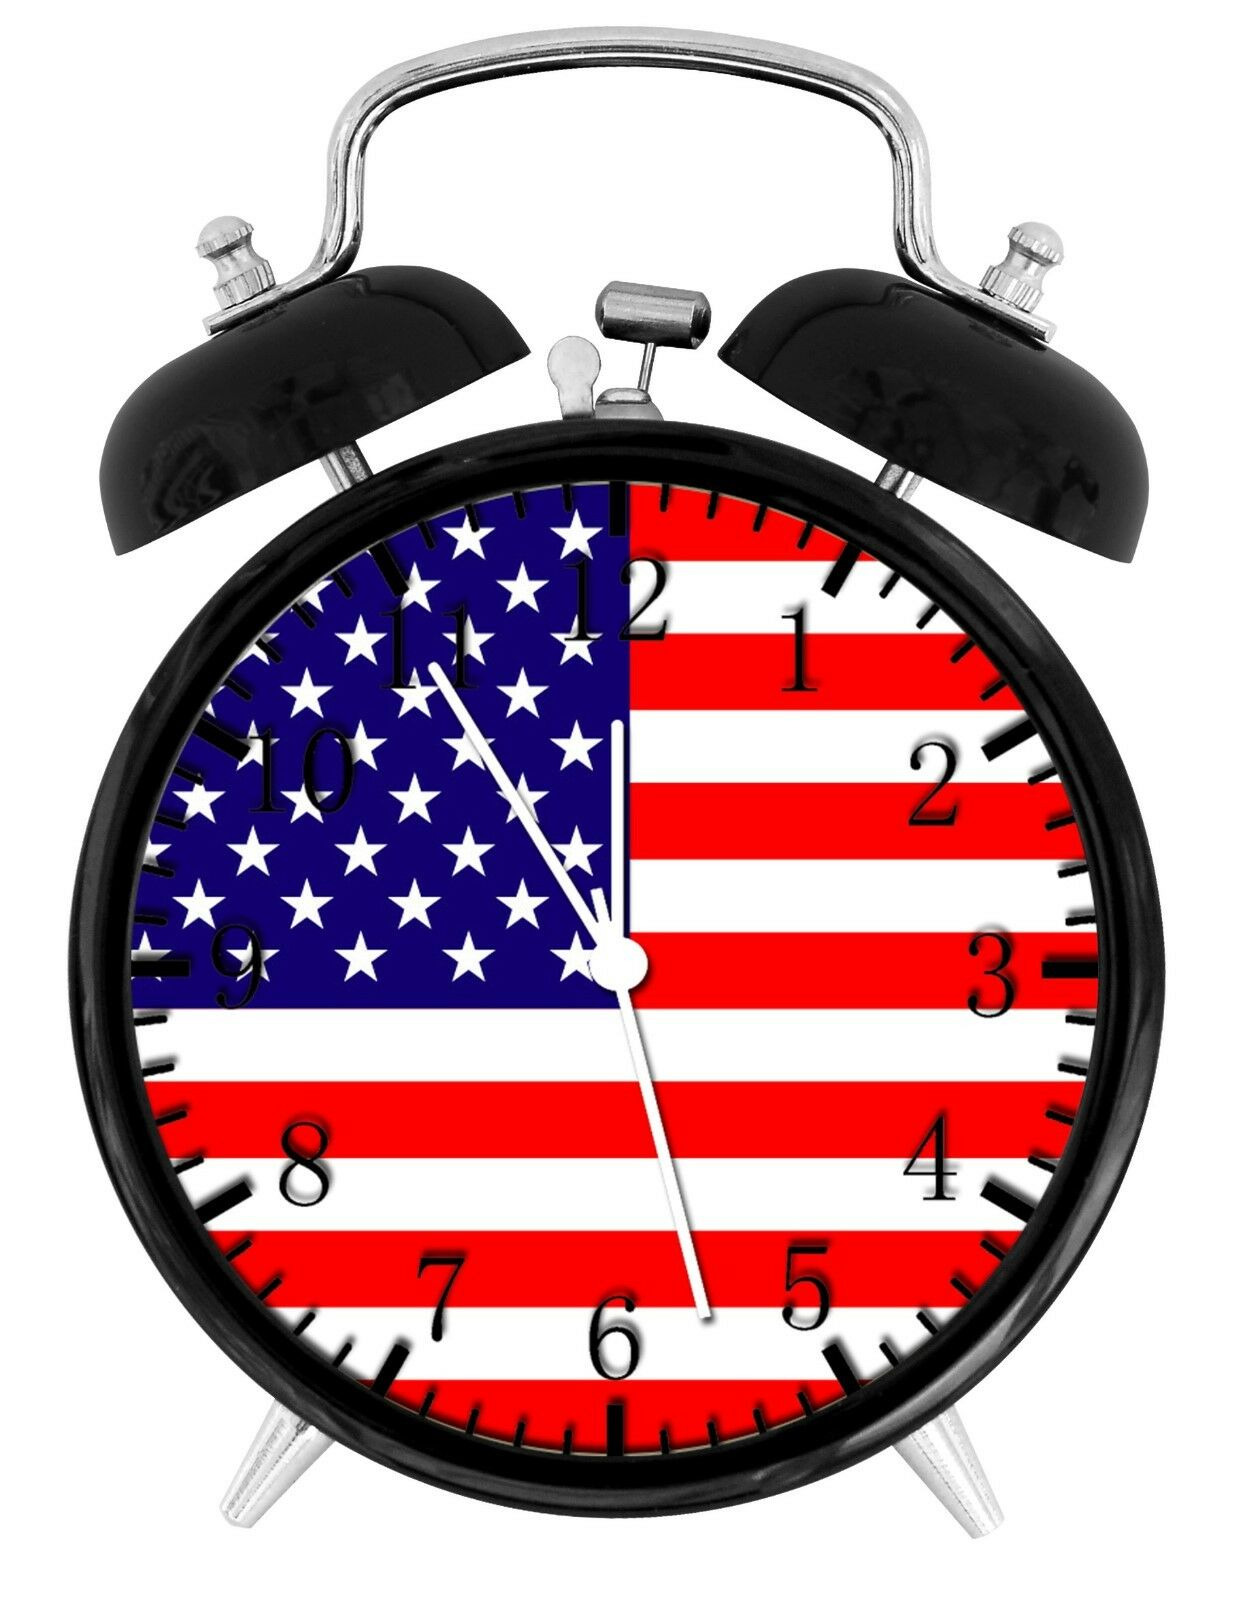 "American Flag Alarm Desk Clock 3.75"" Room Office Decor W26 Be A Nice Gift"